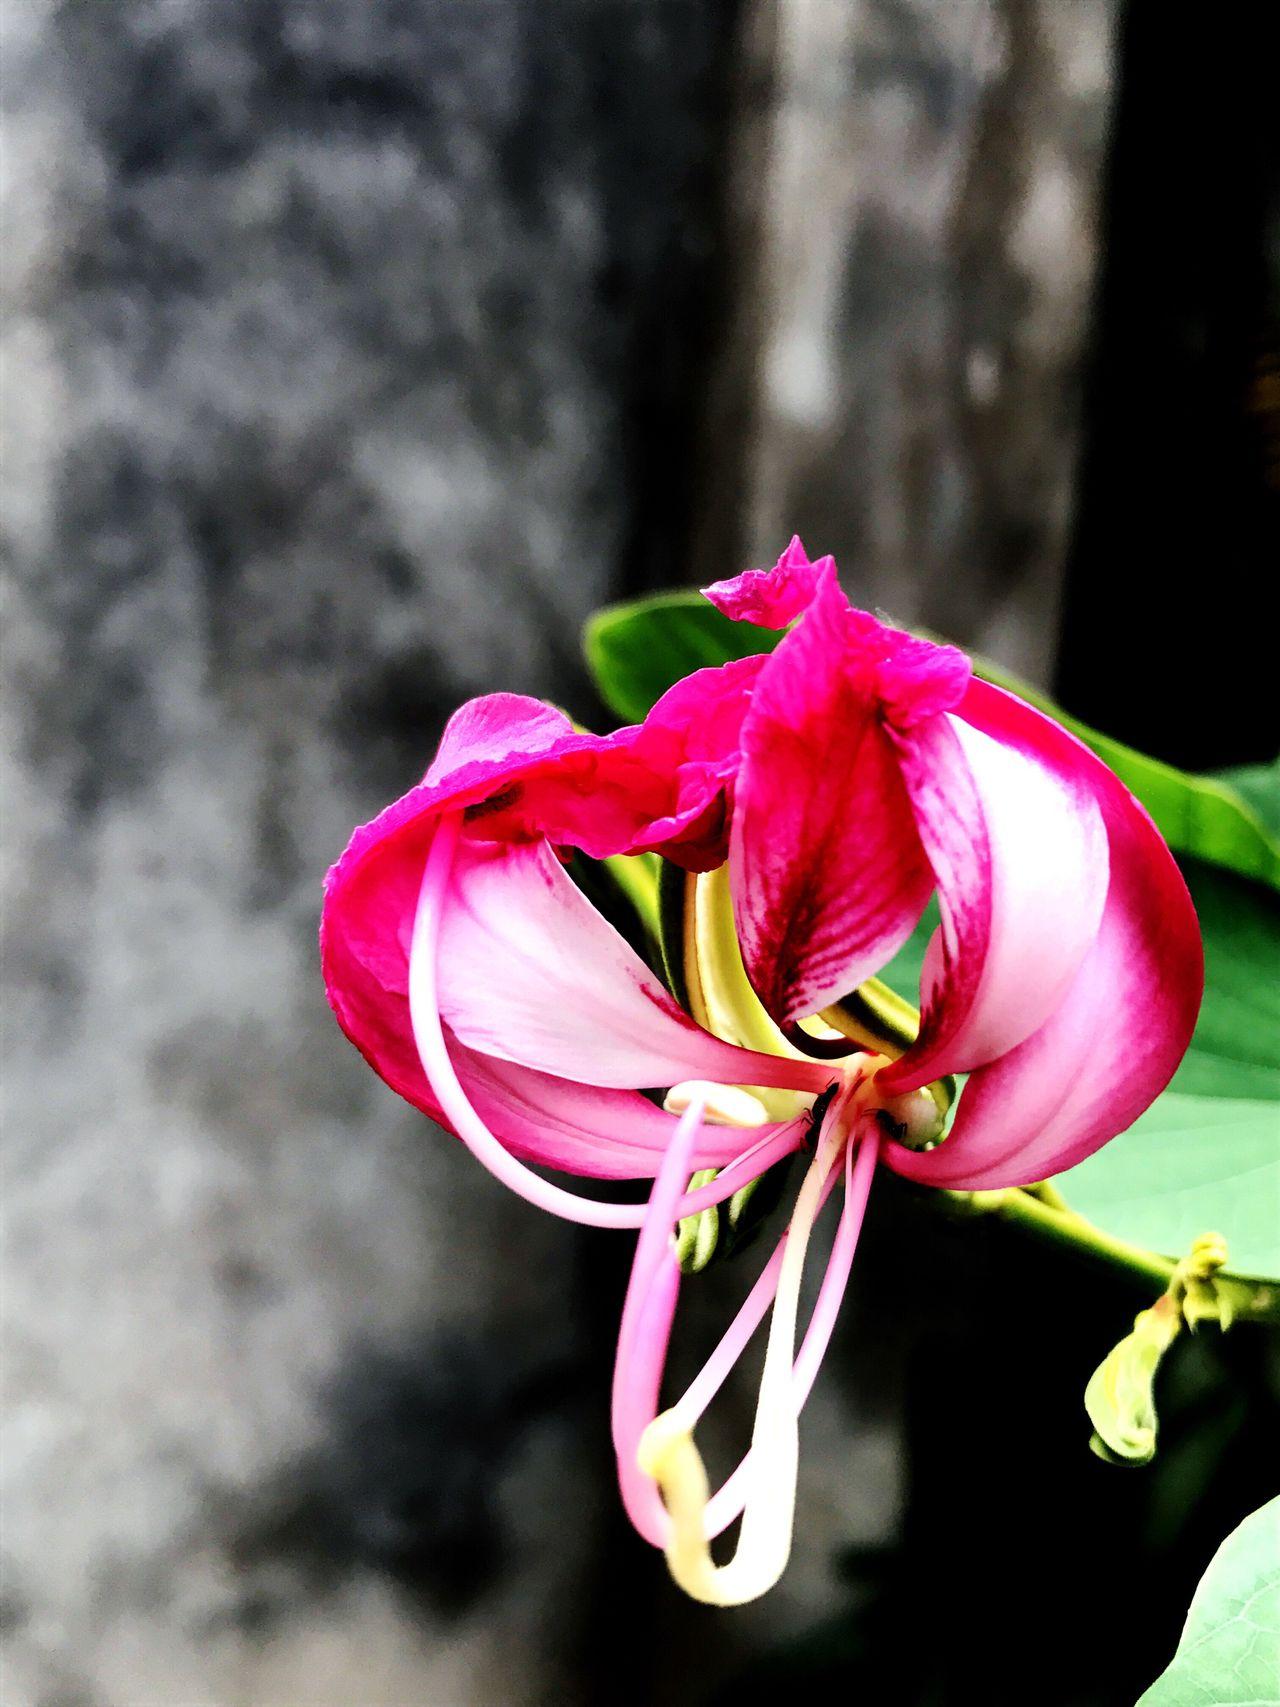 Flower Rose White Medicinal Plant